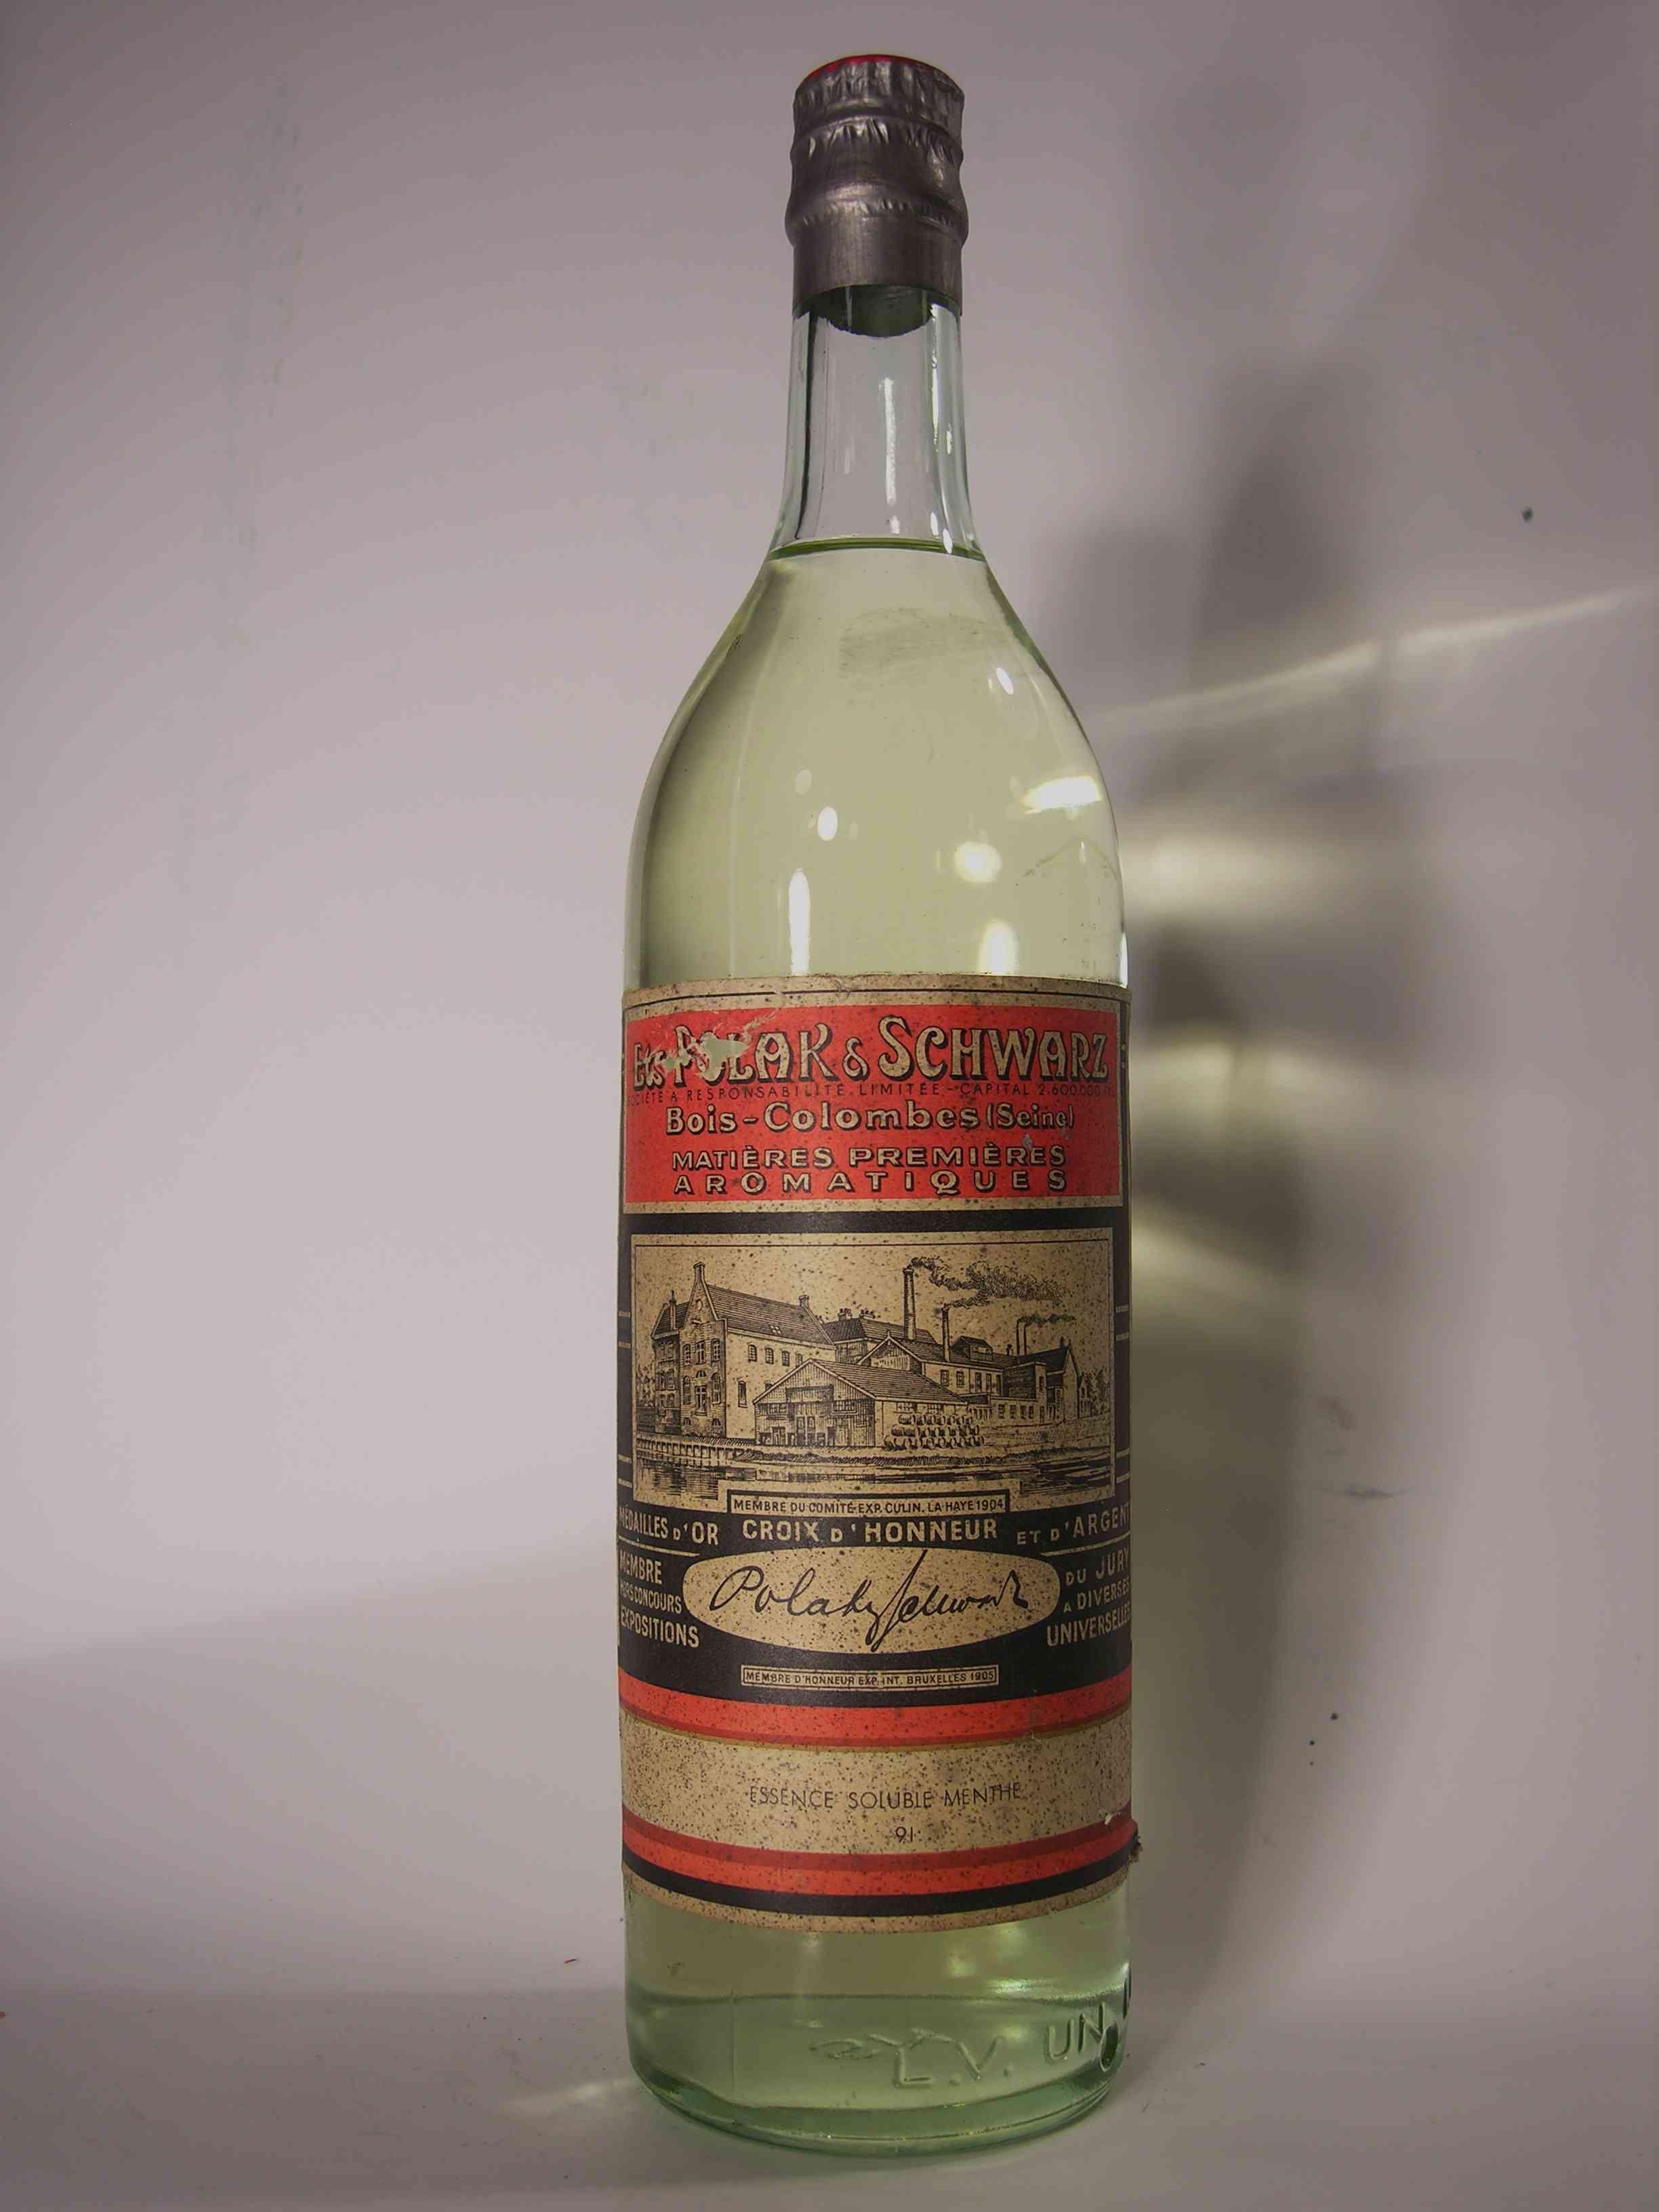 http://vieux-alcools-bistrot.fr/photo/dscn2604.jpg